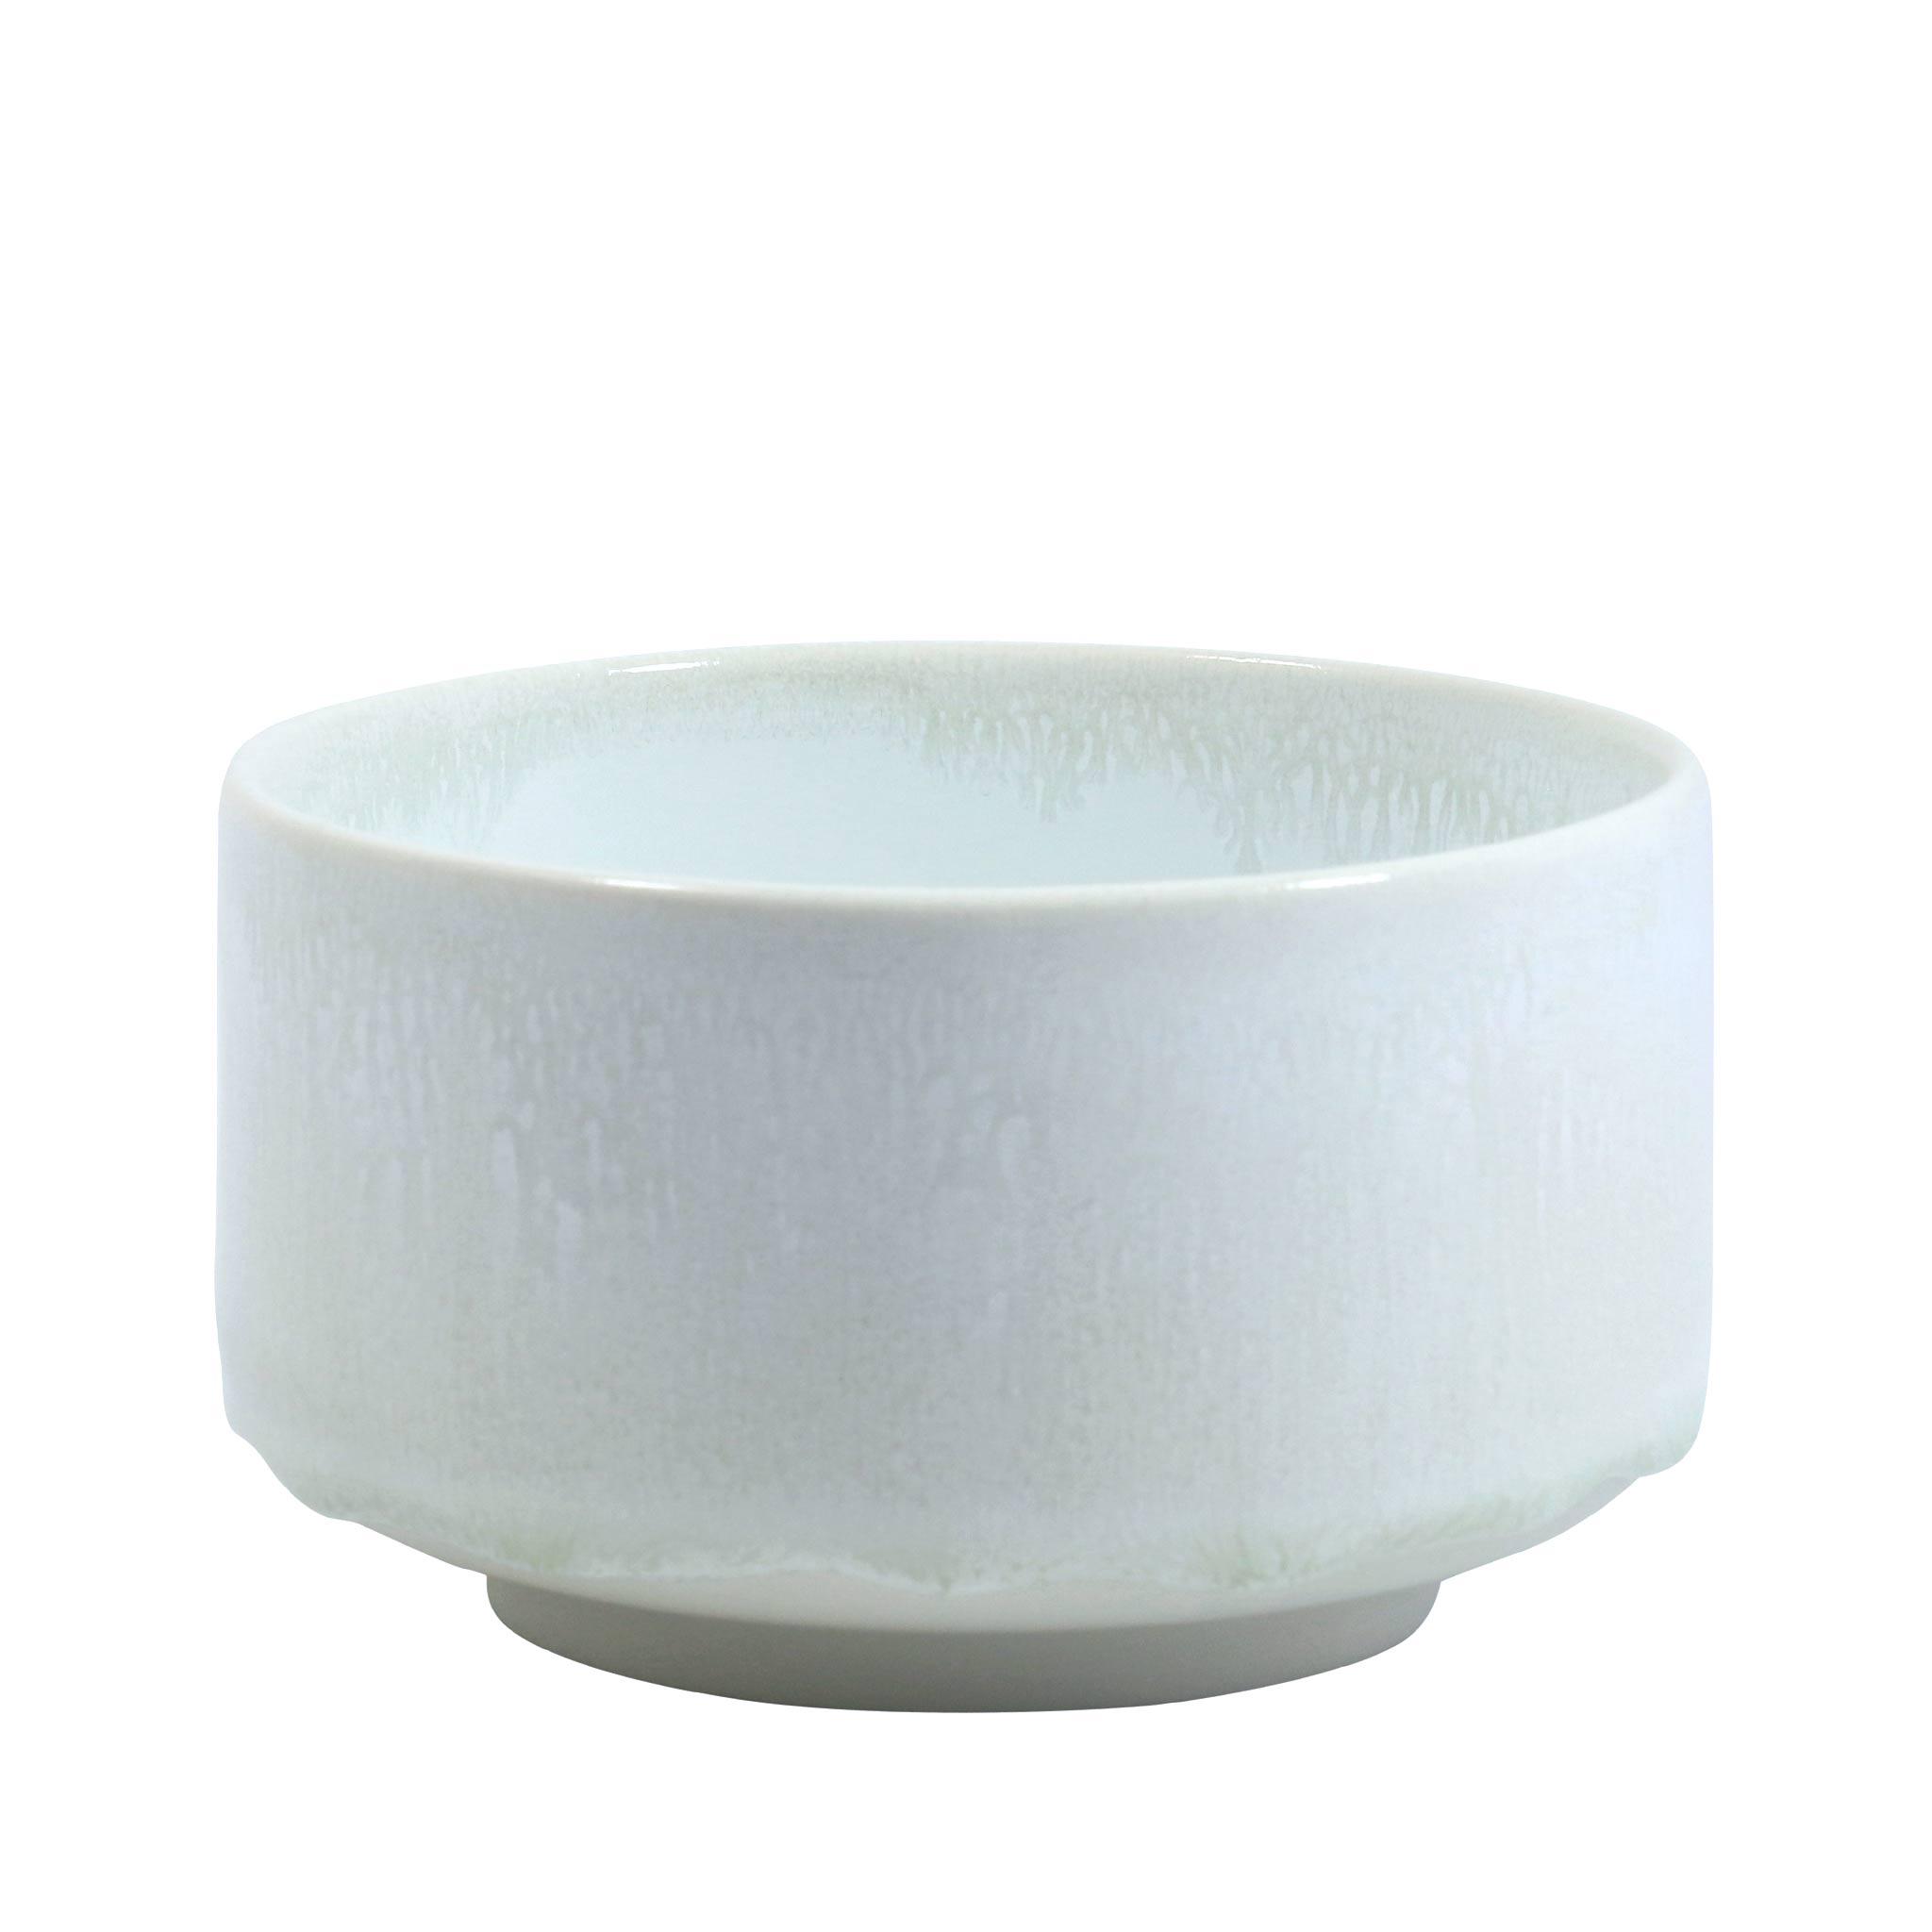 STUDIO ARHØJ - Munch Bowl, Sea Foam